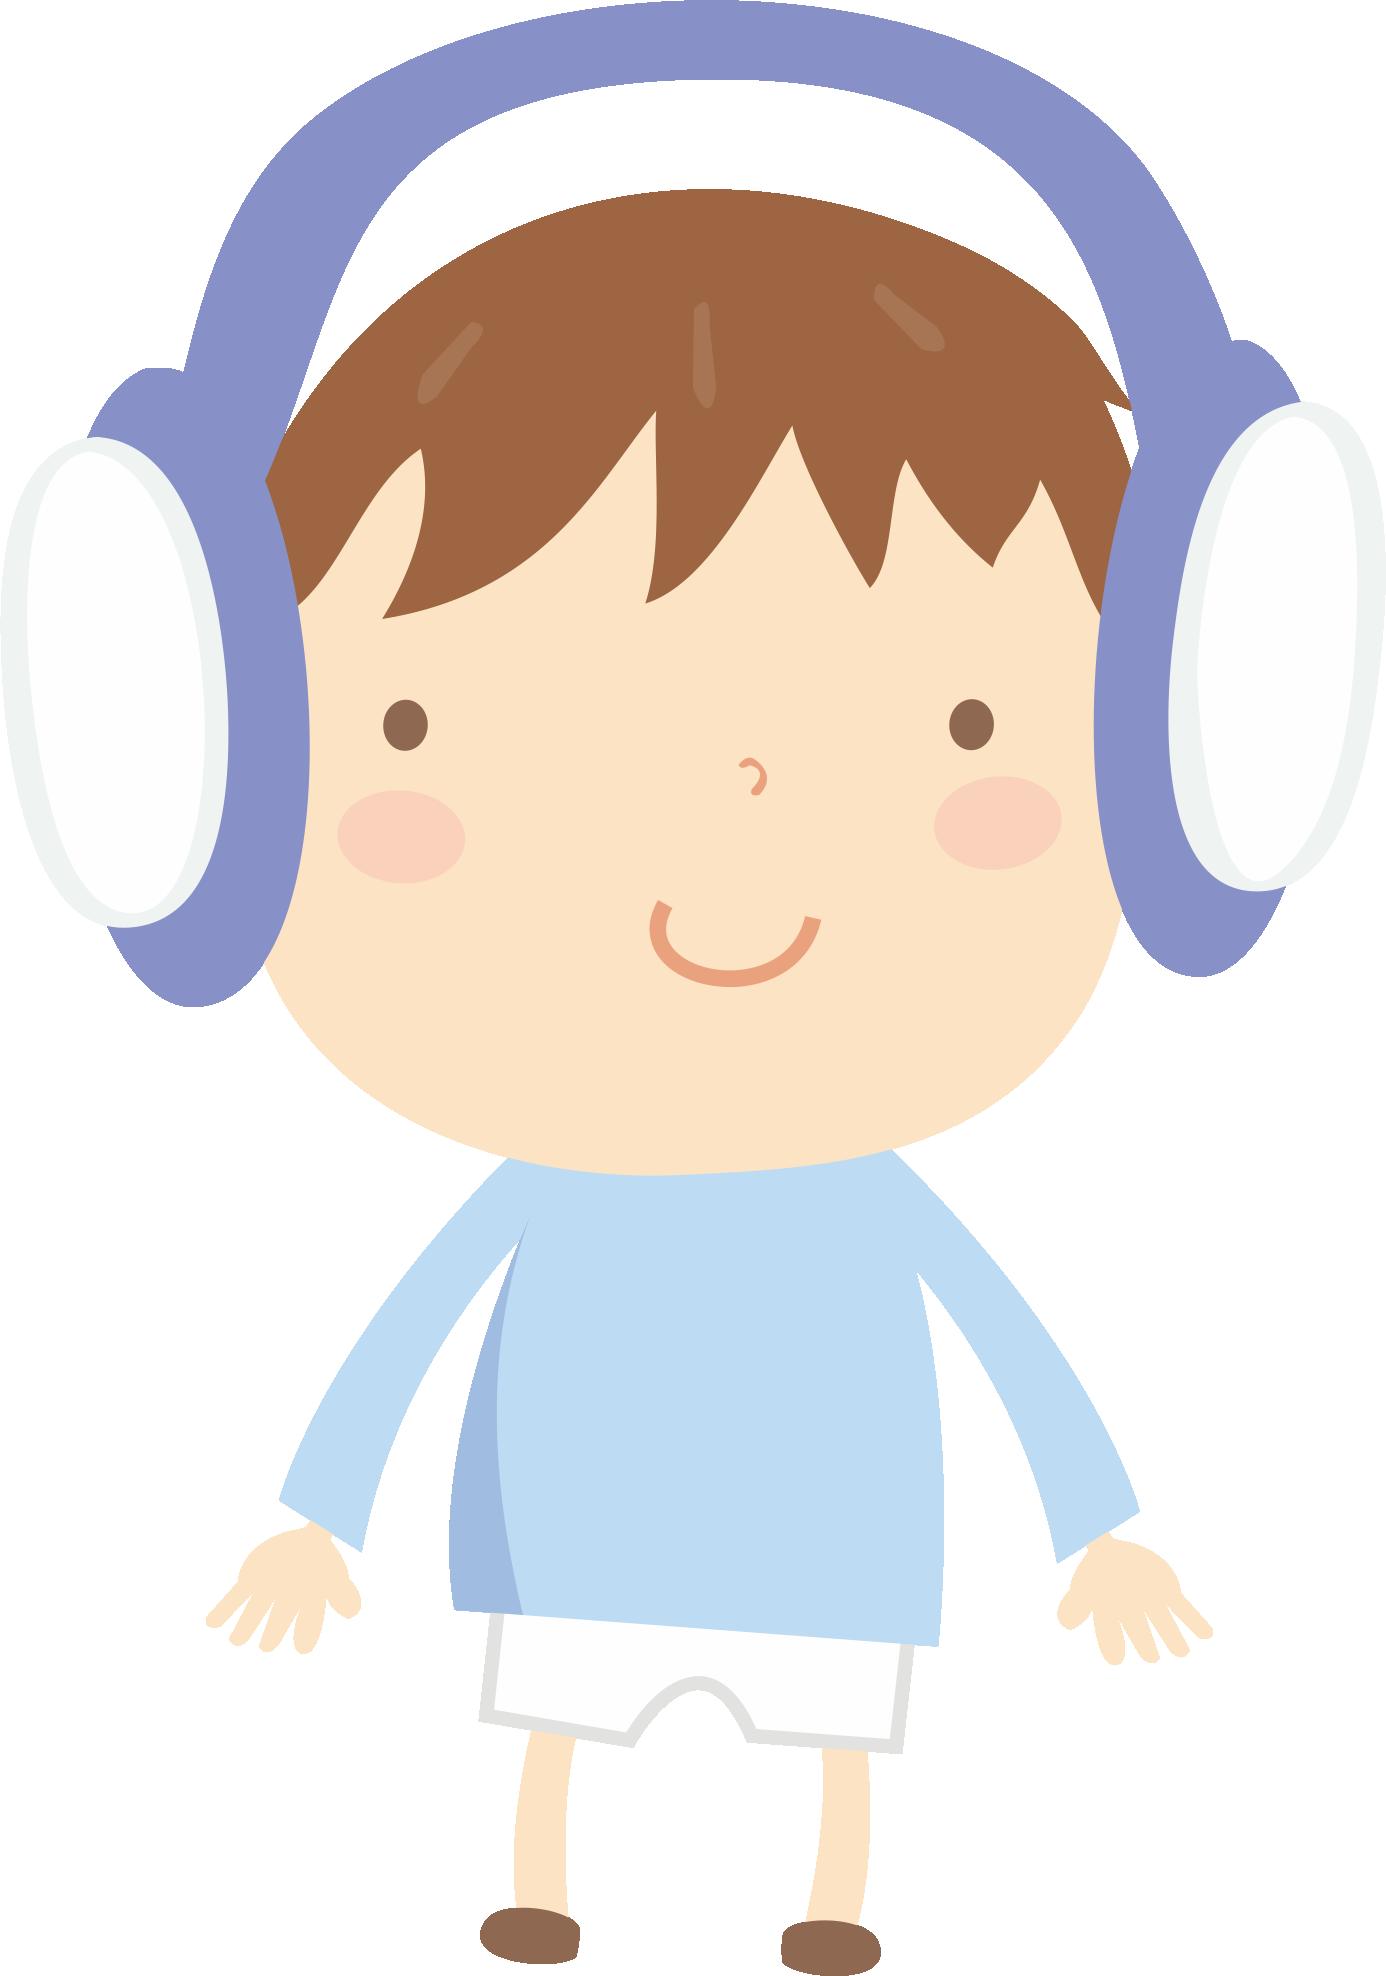 Headphone clipart boy, Headphone boy Transparent FREE for.